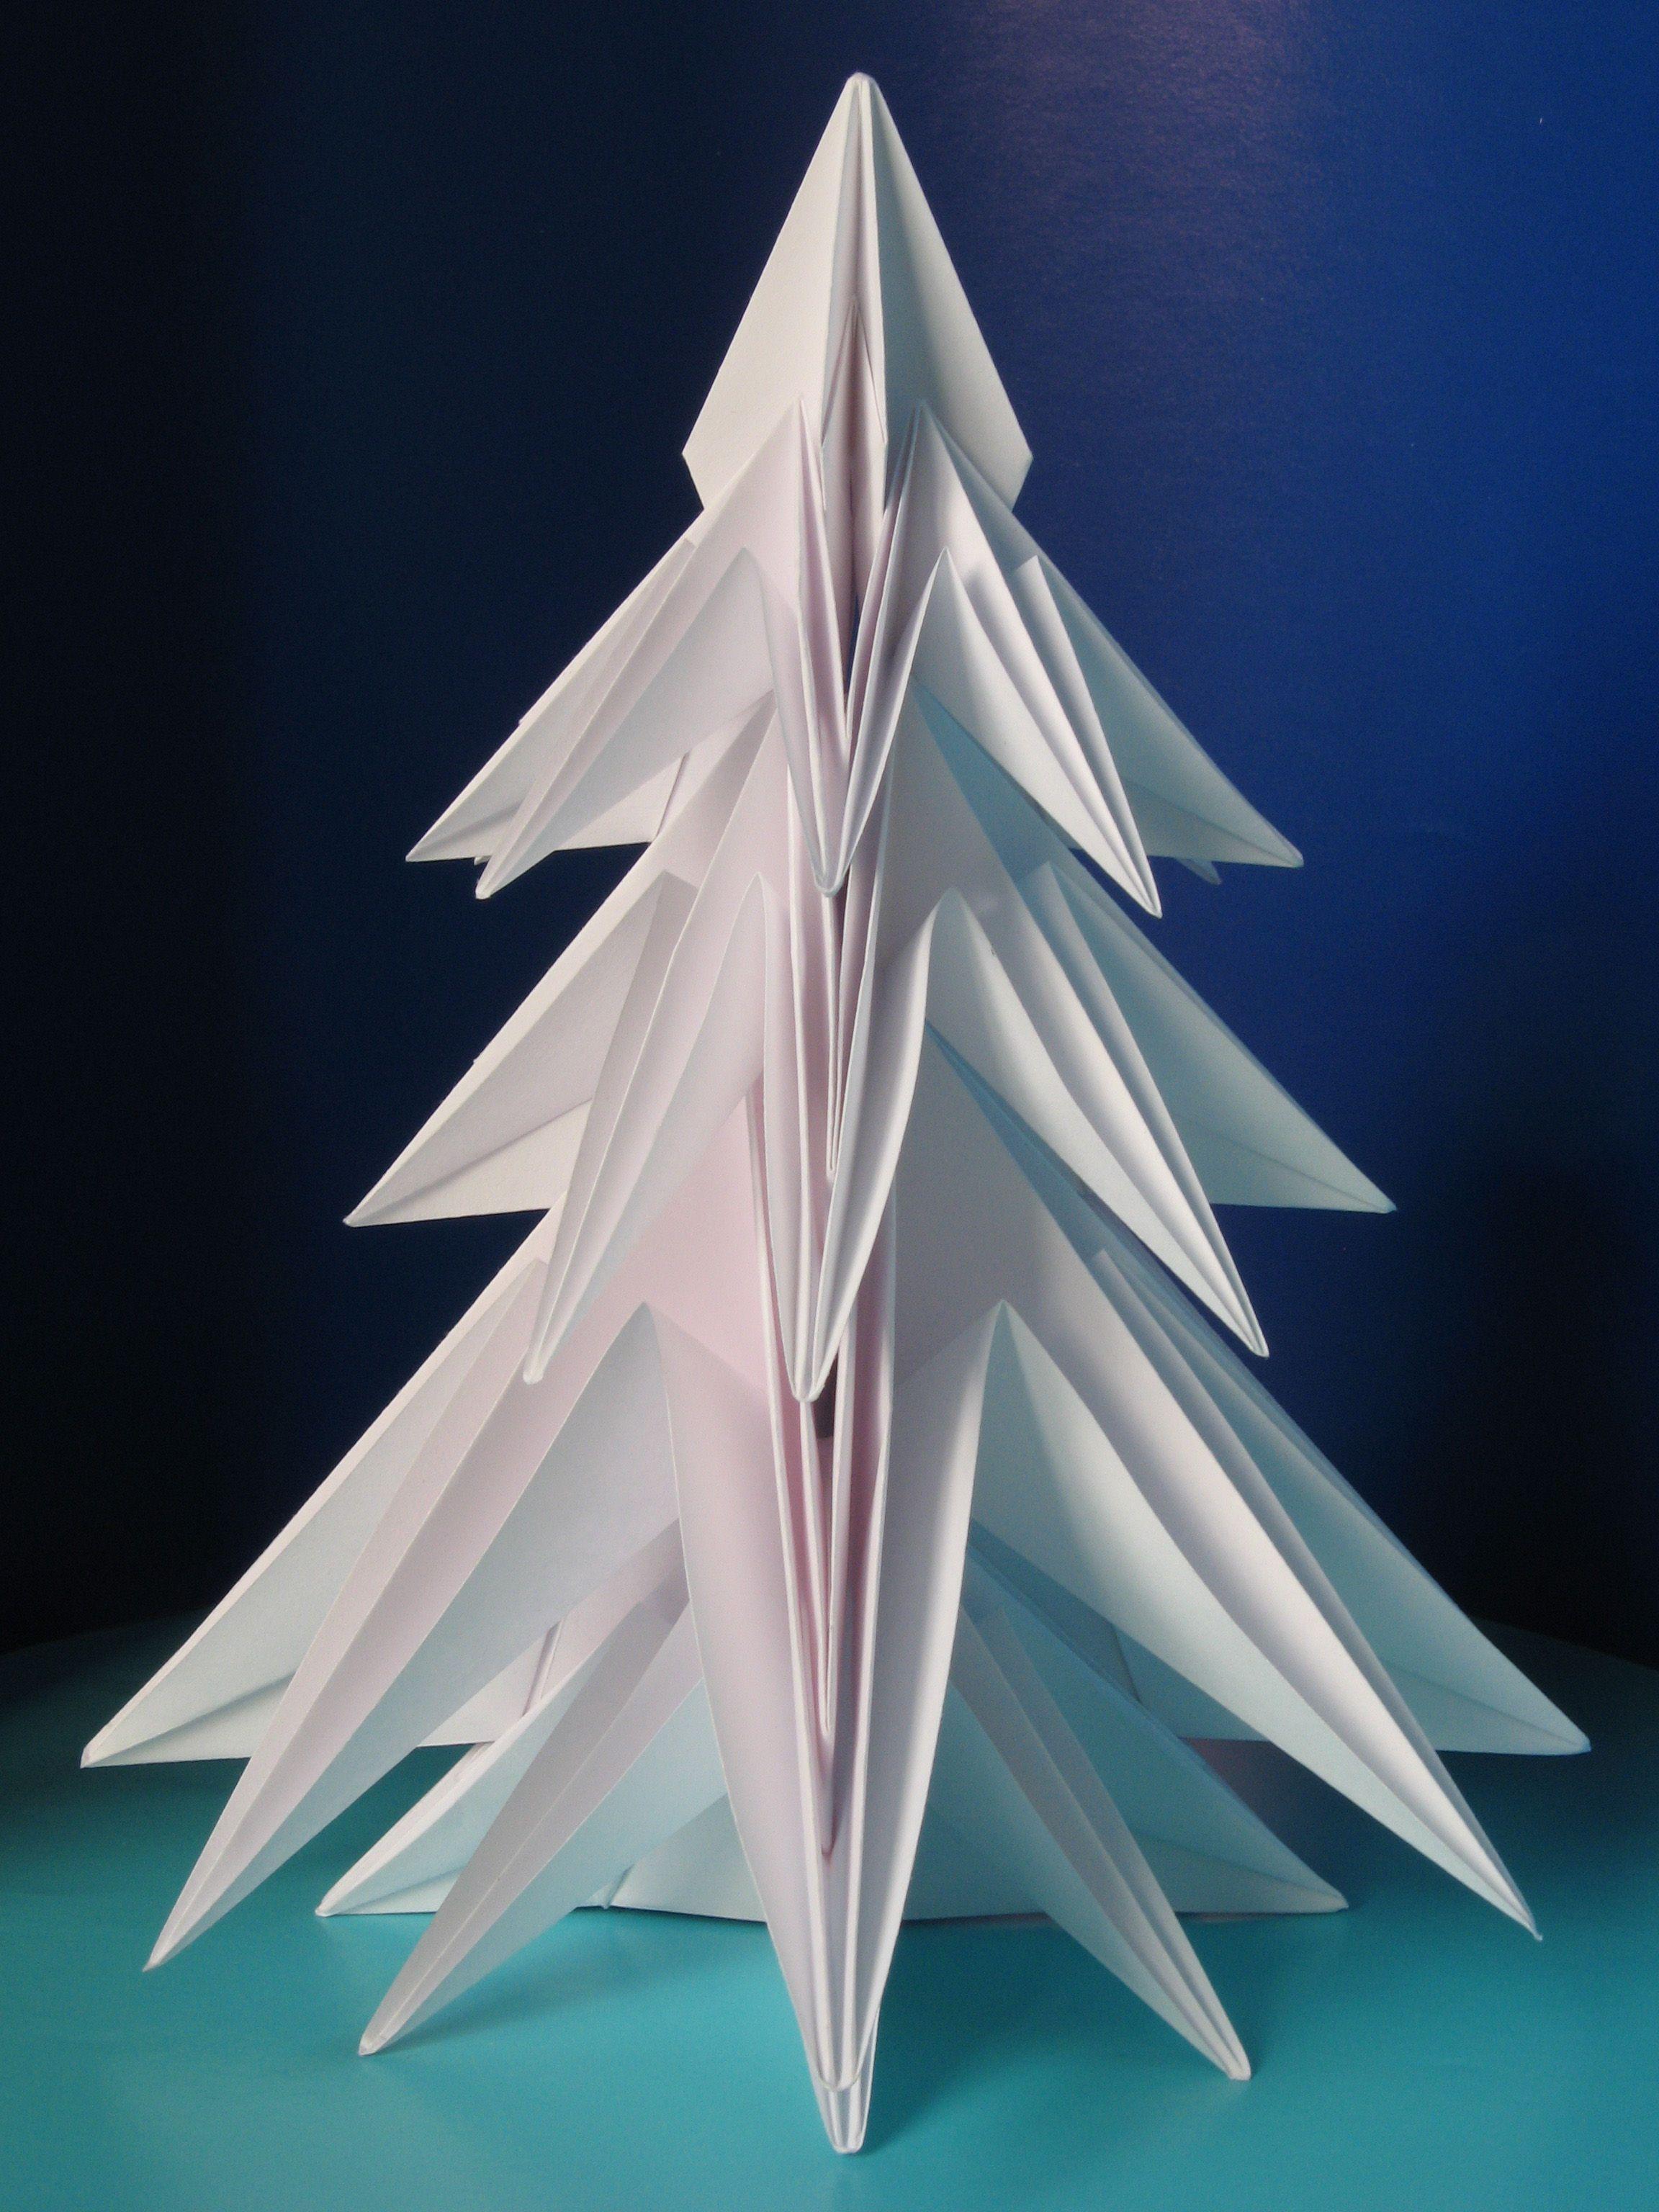 Bialbero di Natale Double Christmas Tree by Francesco Guarnieri | 3072x2304